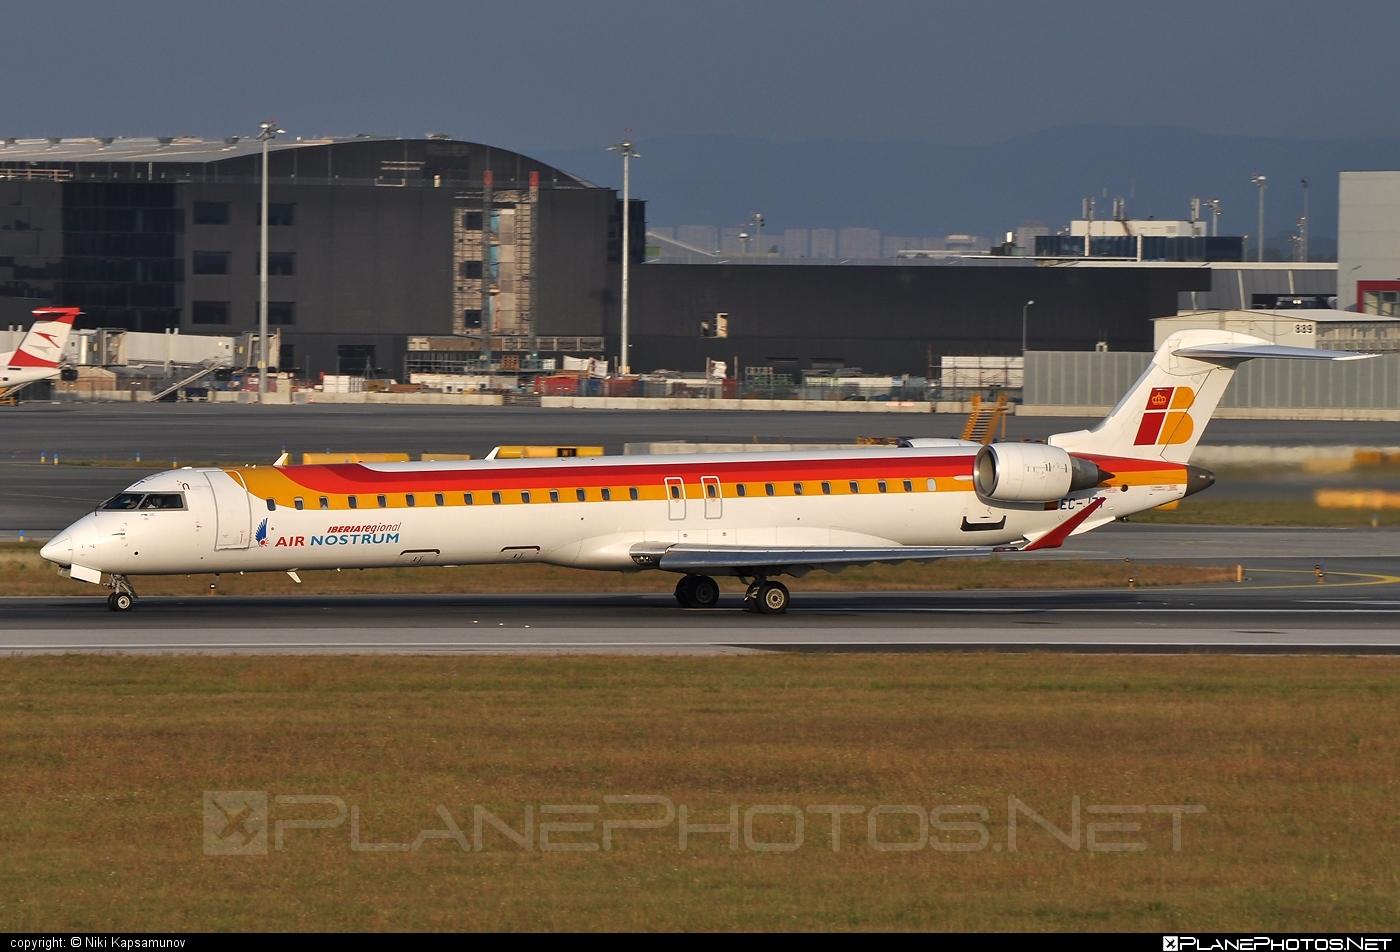 Bombardier CRJ900ER - EC-JZT operated by Iberia Regional (Air Nostrum) #airnostrum #bombardier #crj900 #crj900er #iberia #iberiaregional